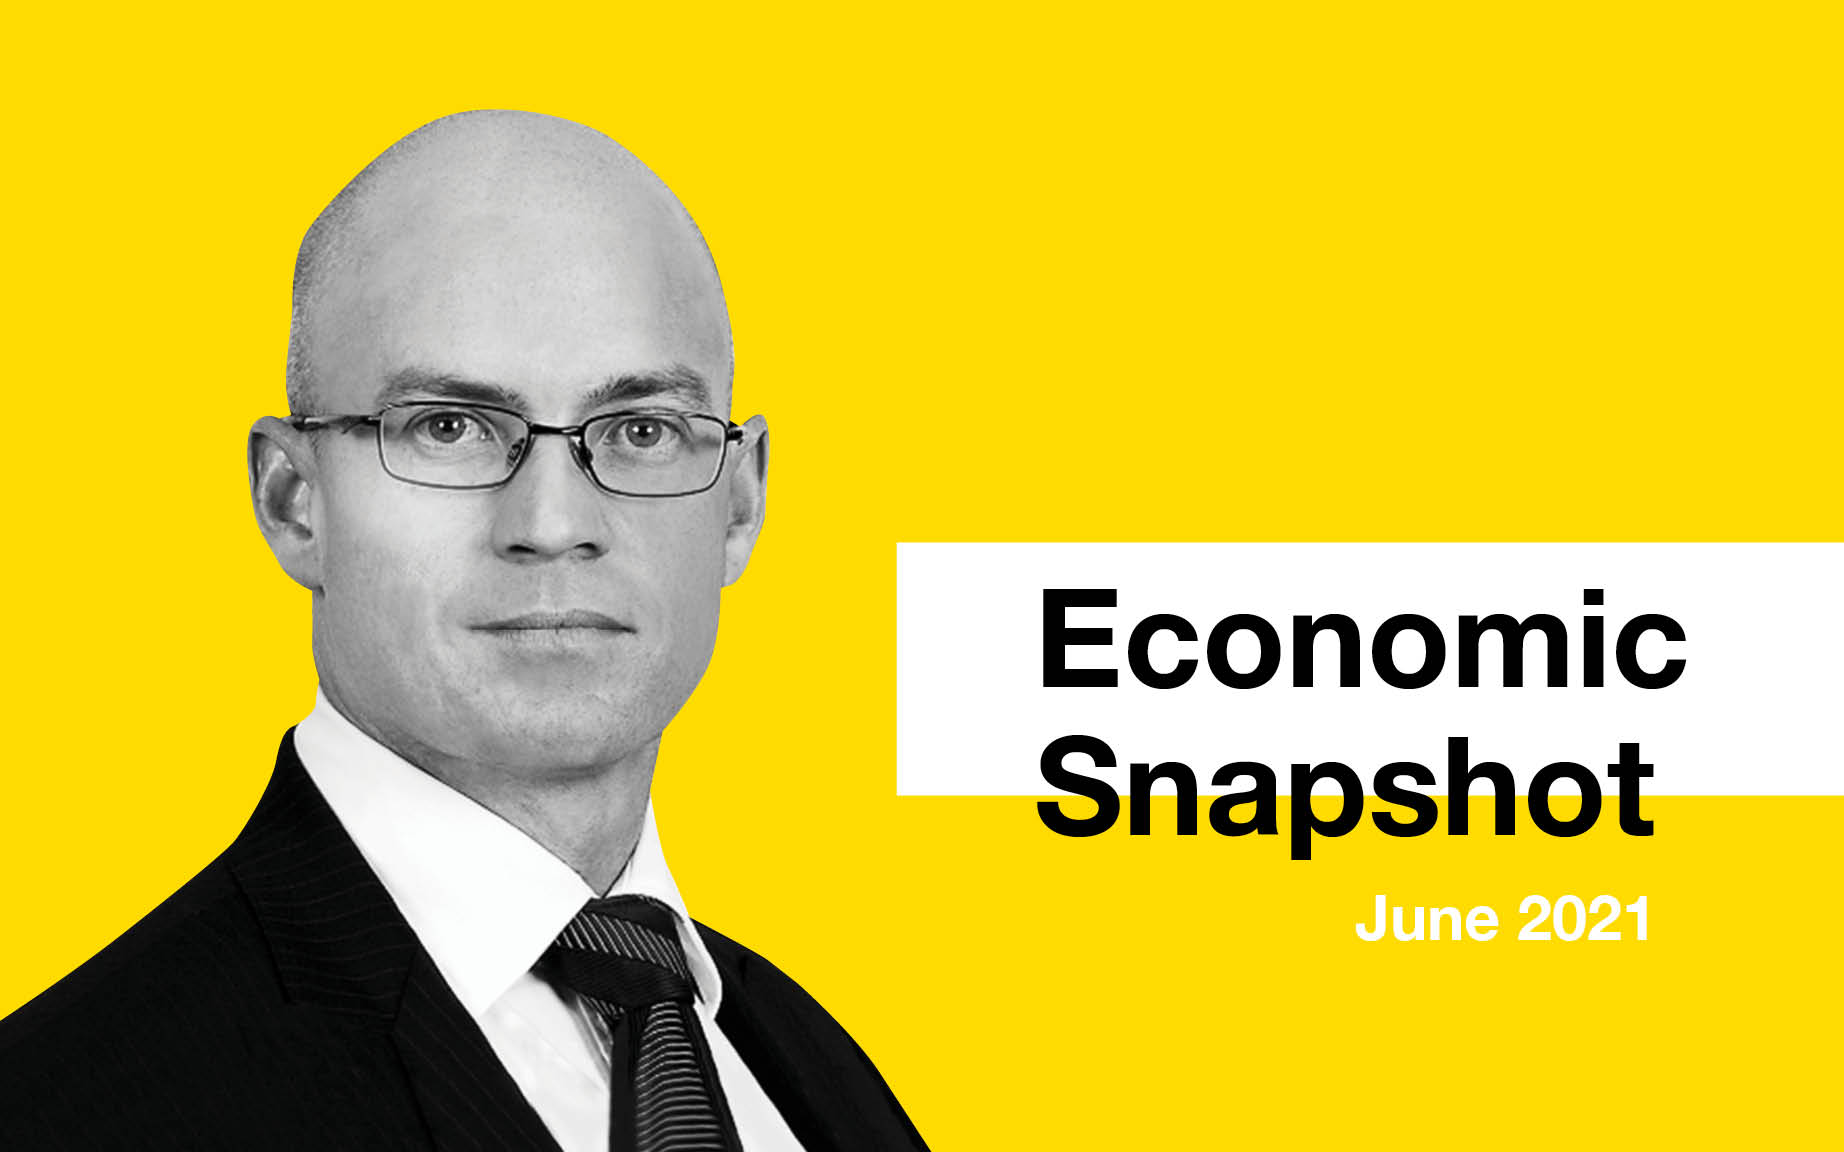 Economic Snapshot June 2021